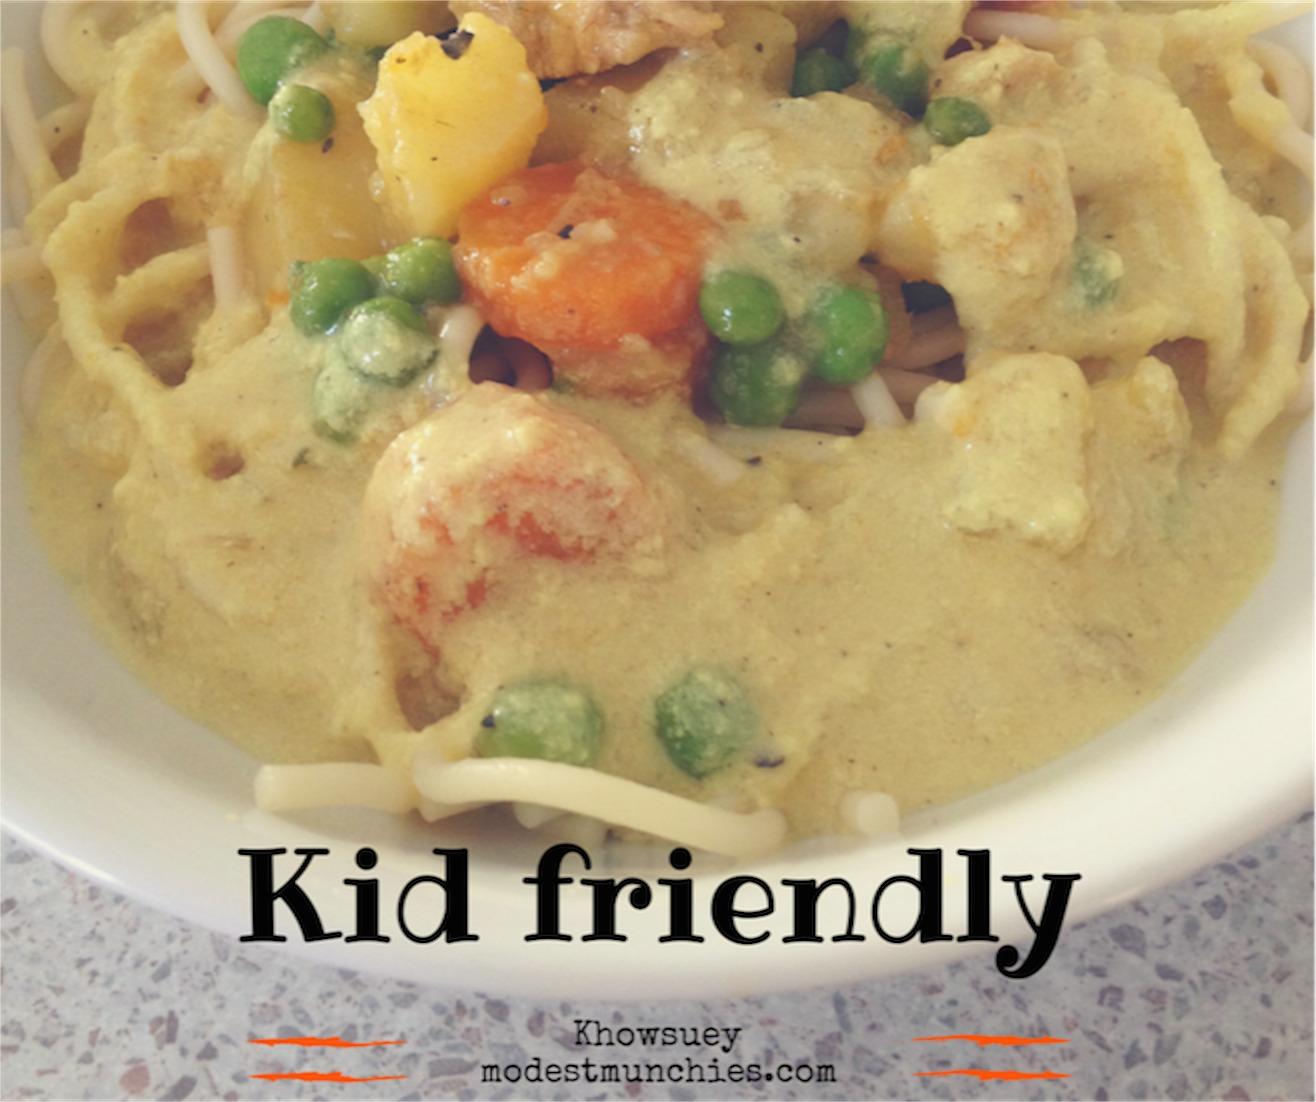 Kid friendly khowsuey_3